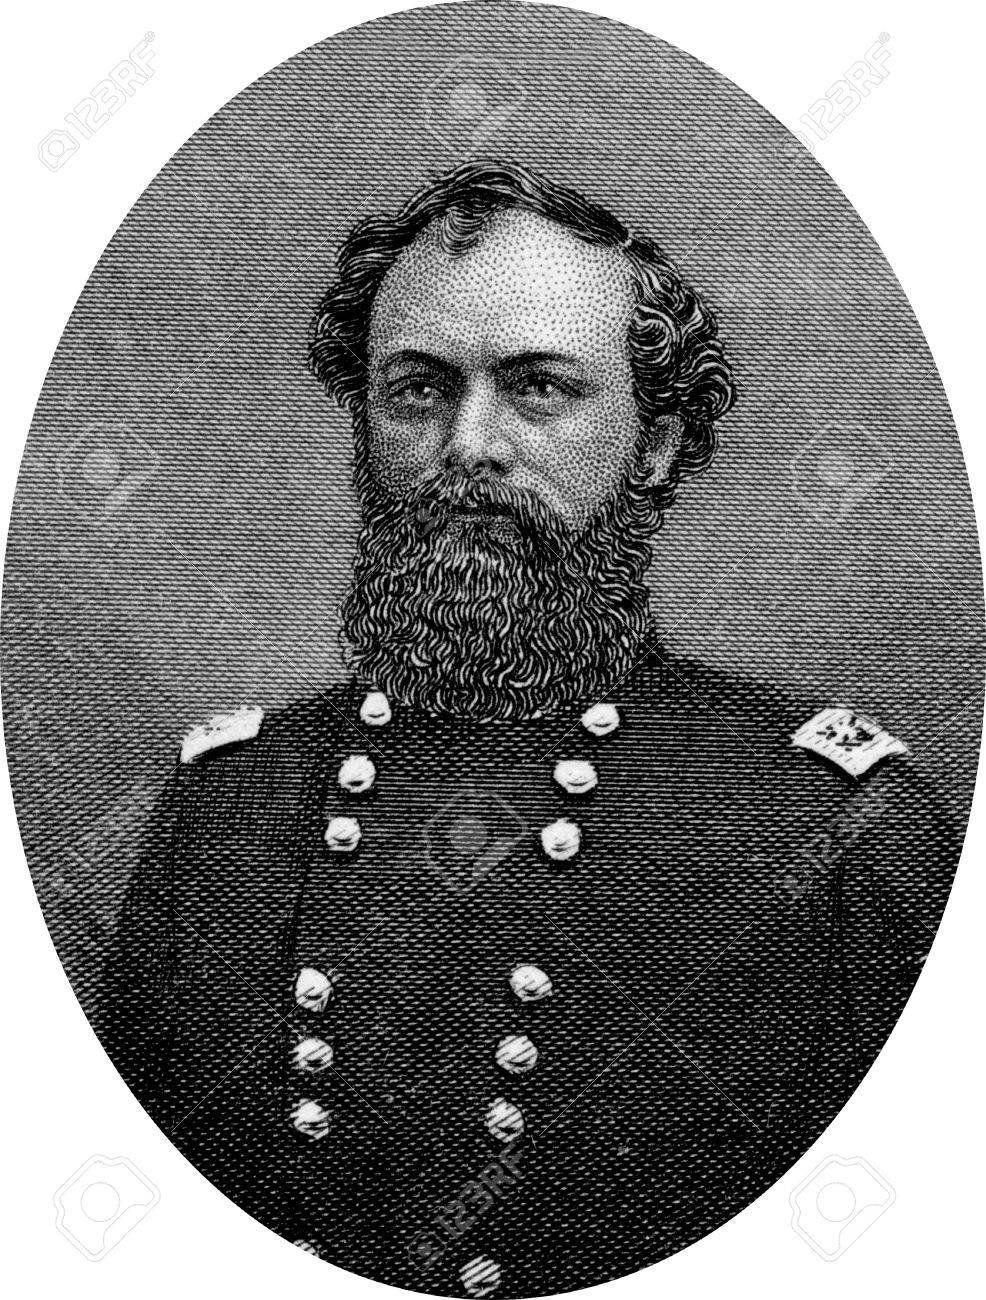 連合少将 Quincy Adams Gillmore...